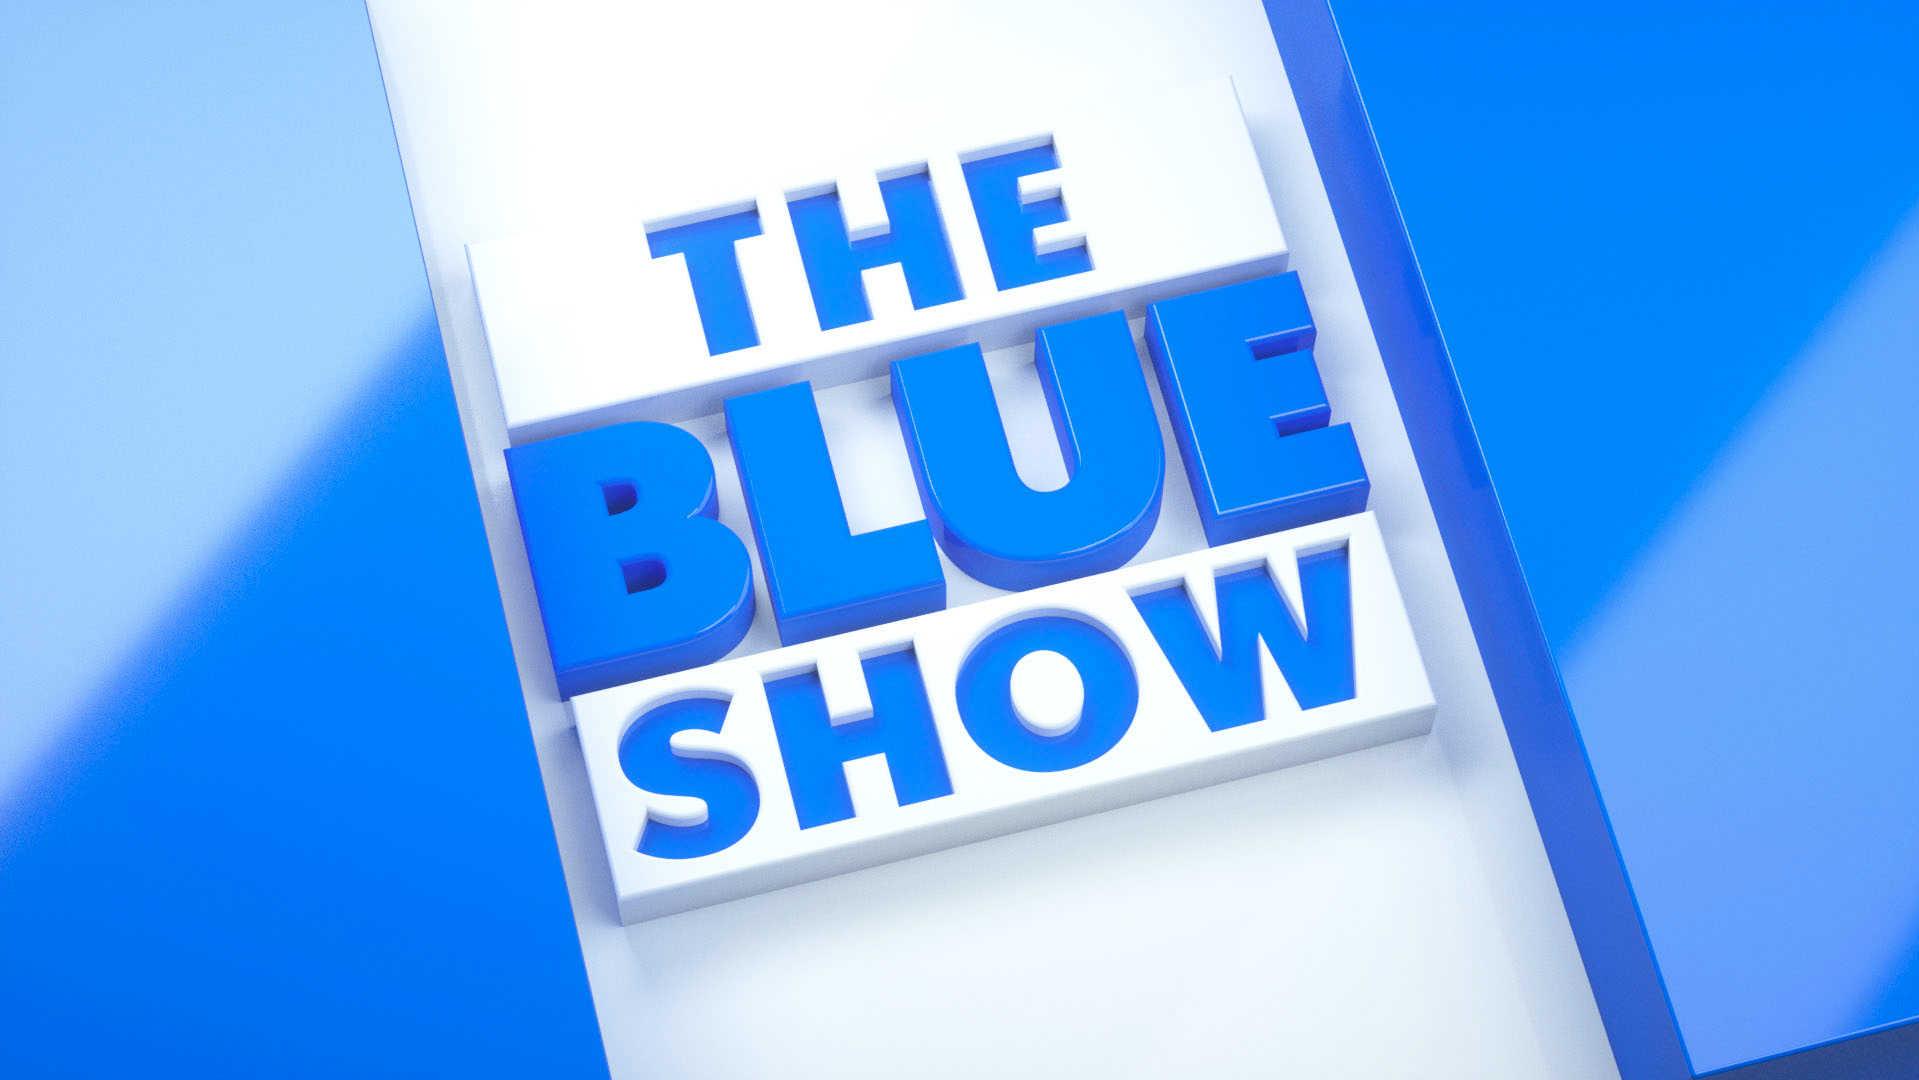 The Blue Show